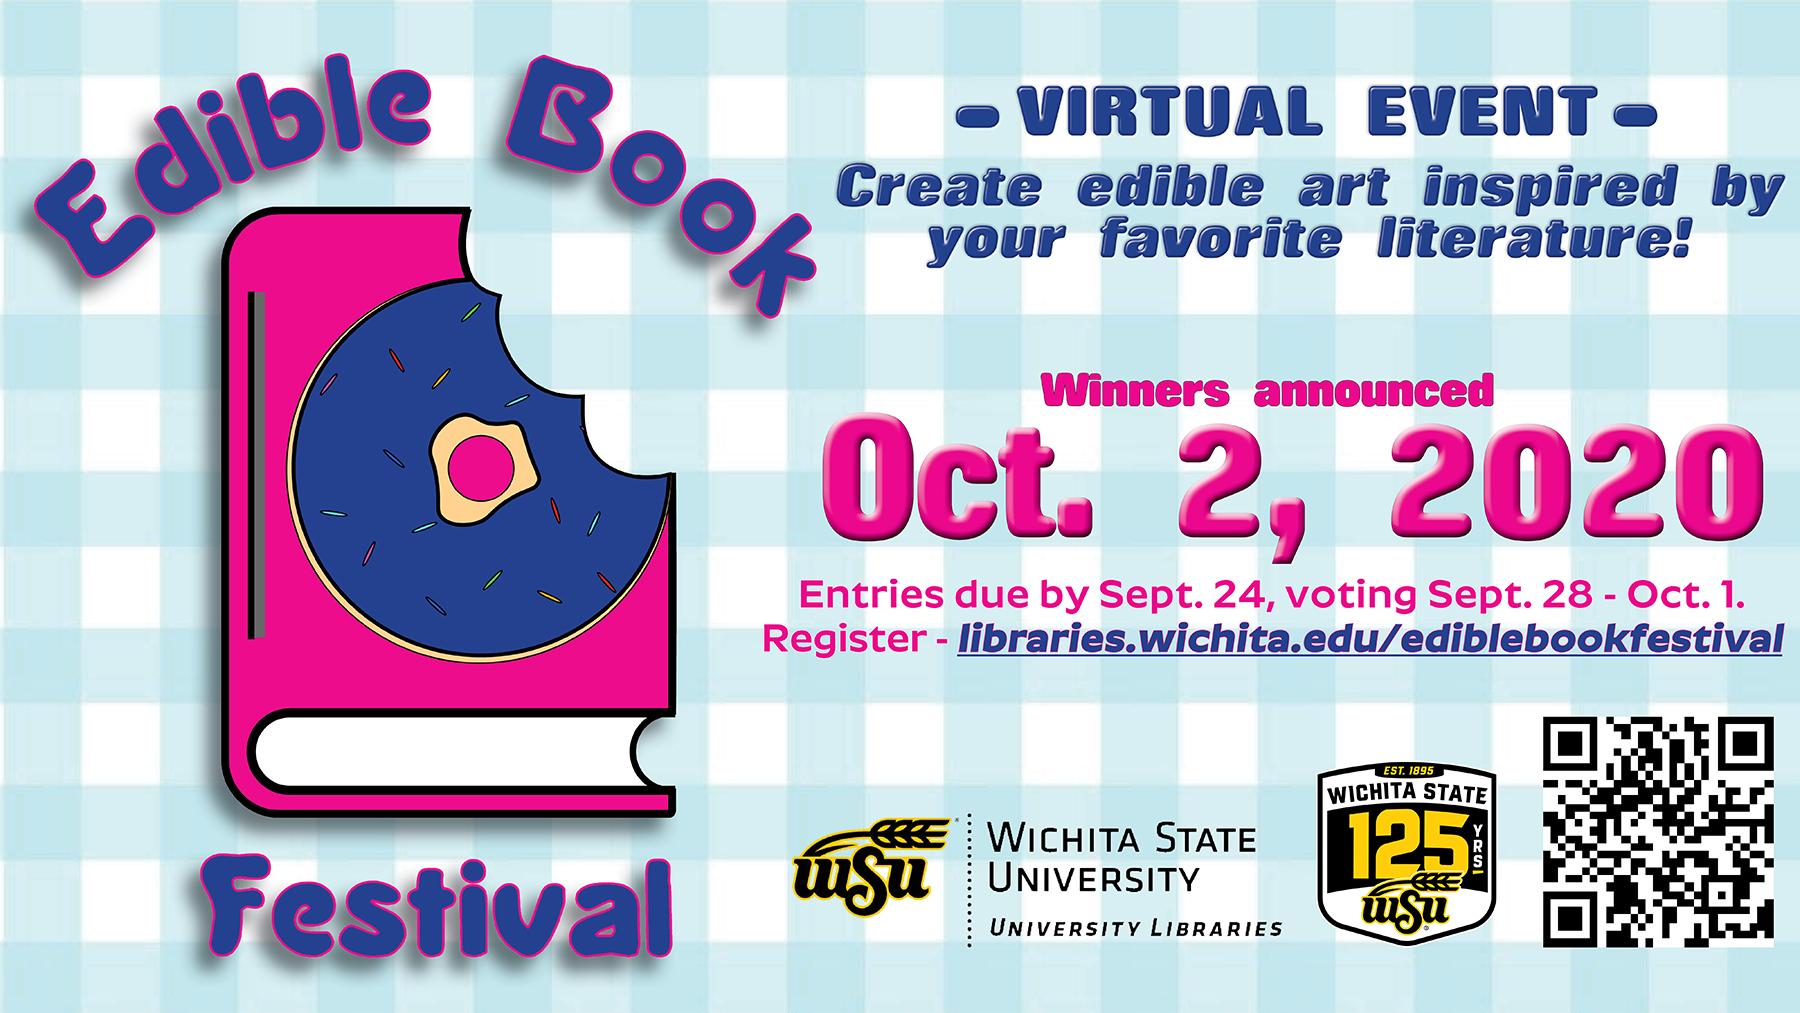 Edible Book Festival Online Voting